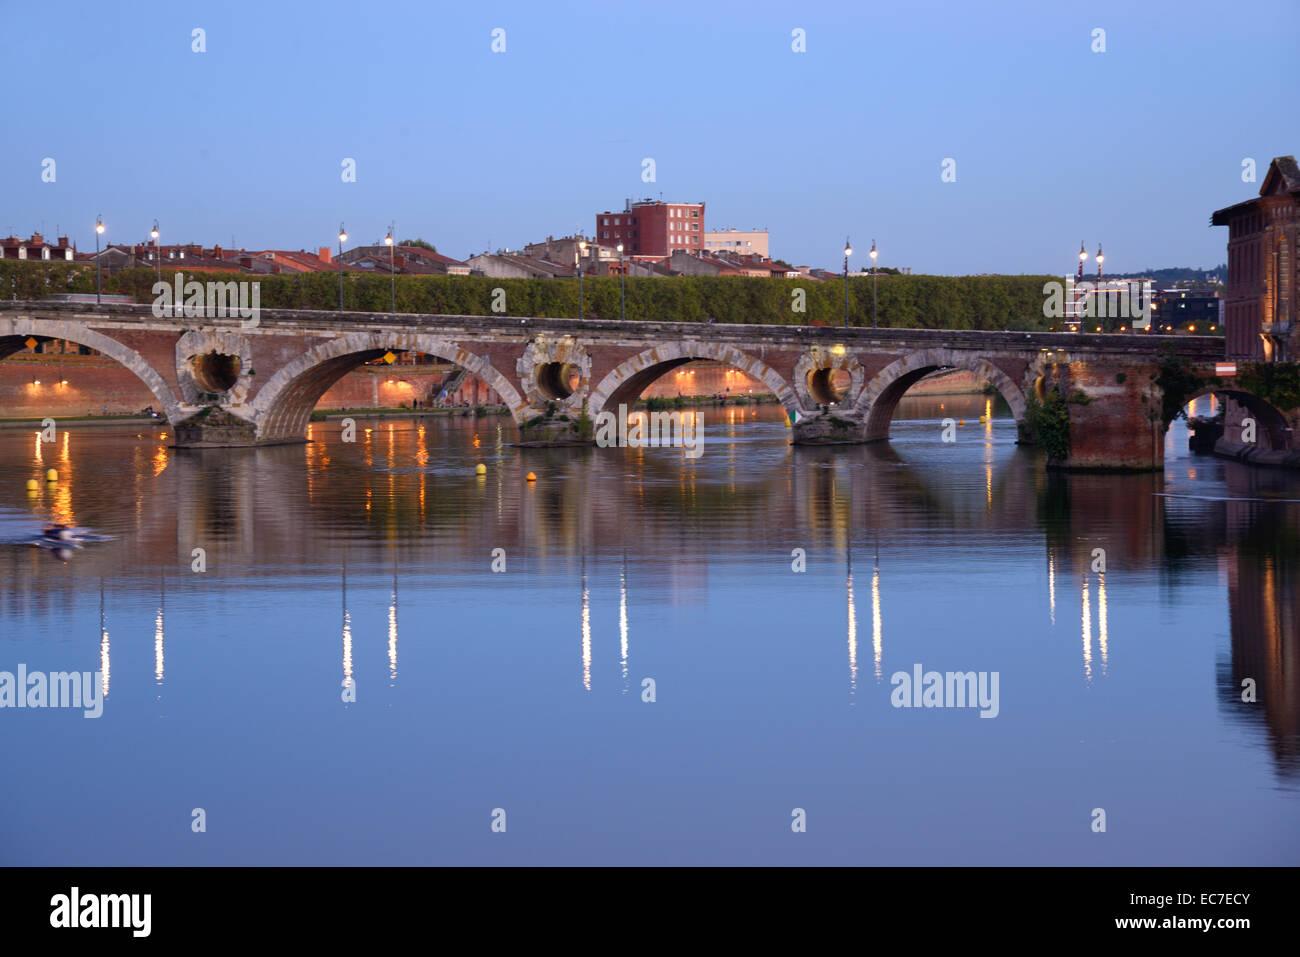 Pont Neuf or New Bridge over River Garonne at Night Toulouse Haute-Garonne France - Stock Image